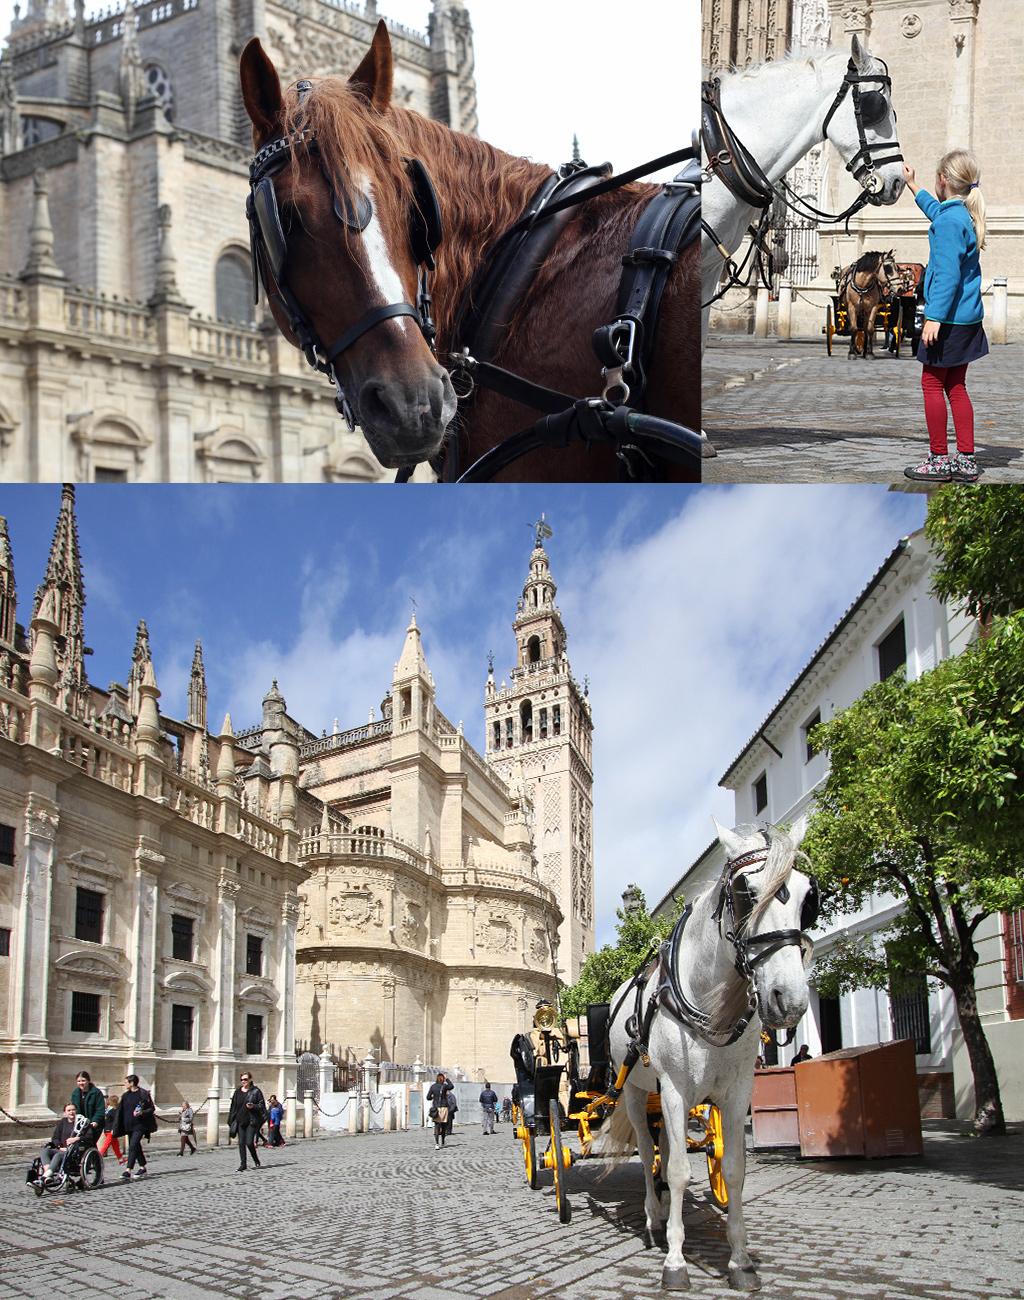 stedentrip Sevilla met kinderen - paardenkoets